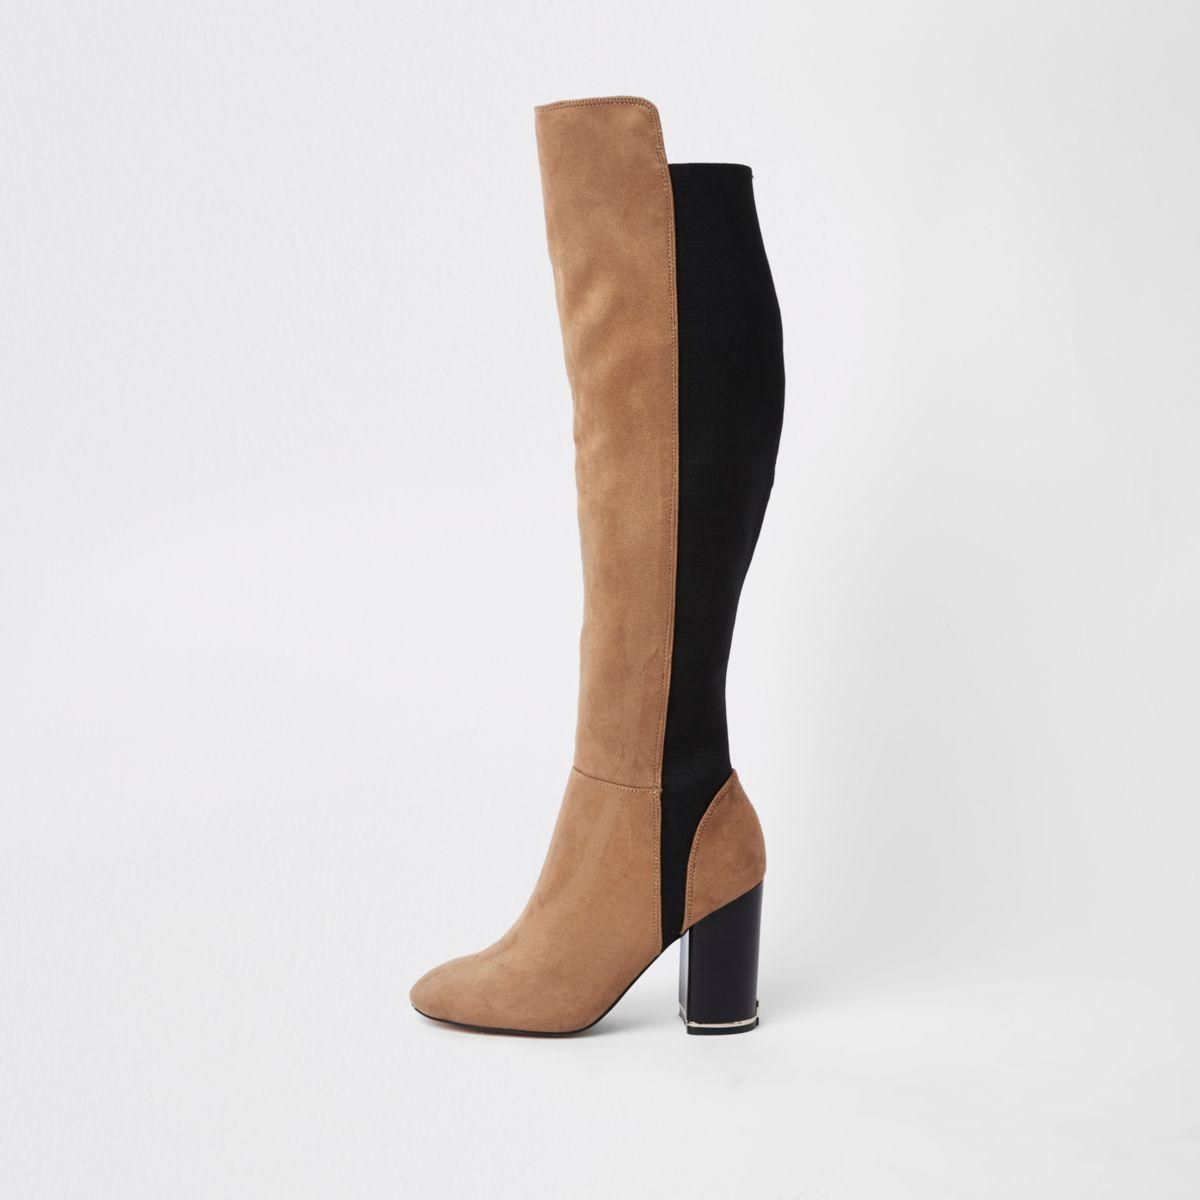 Light brown knee high contrast boots